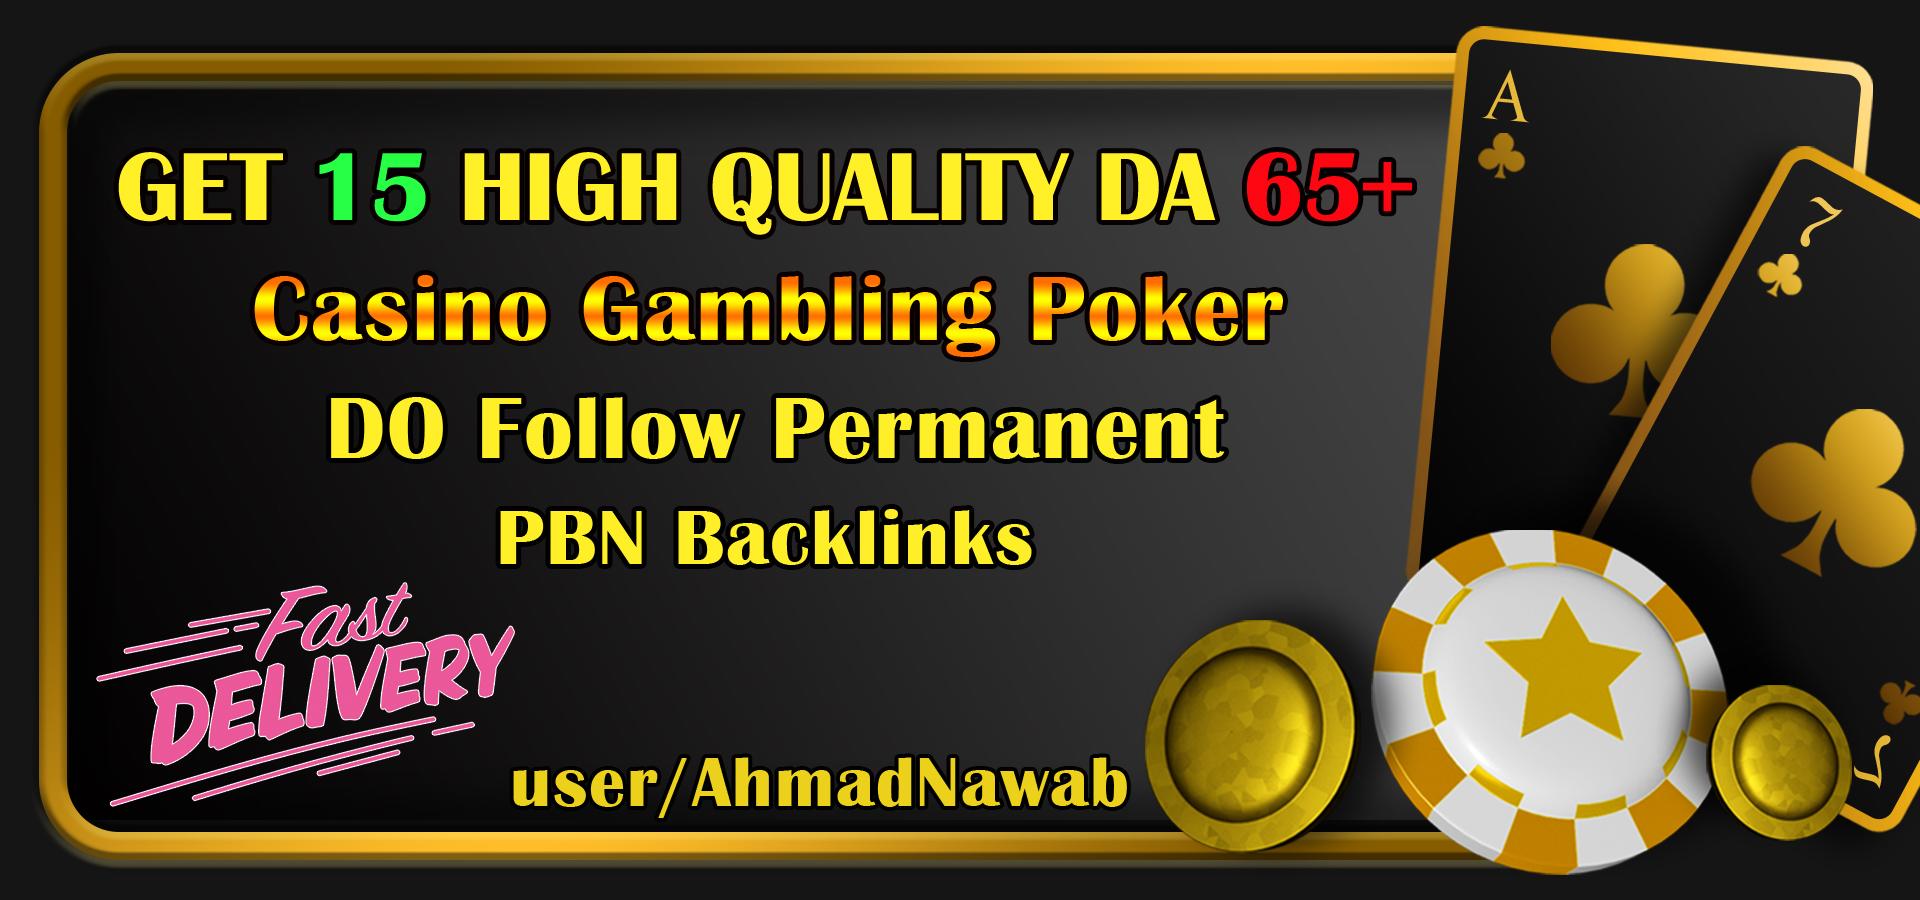 Get 15 DA 65+ plus Casino Gambling poker homepage pbn backlinks and judi related sites.